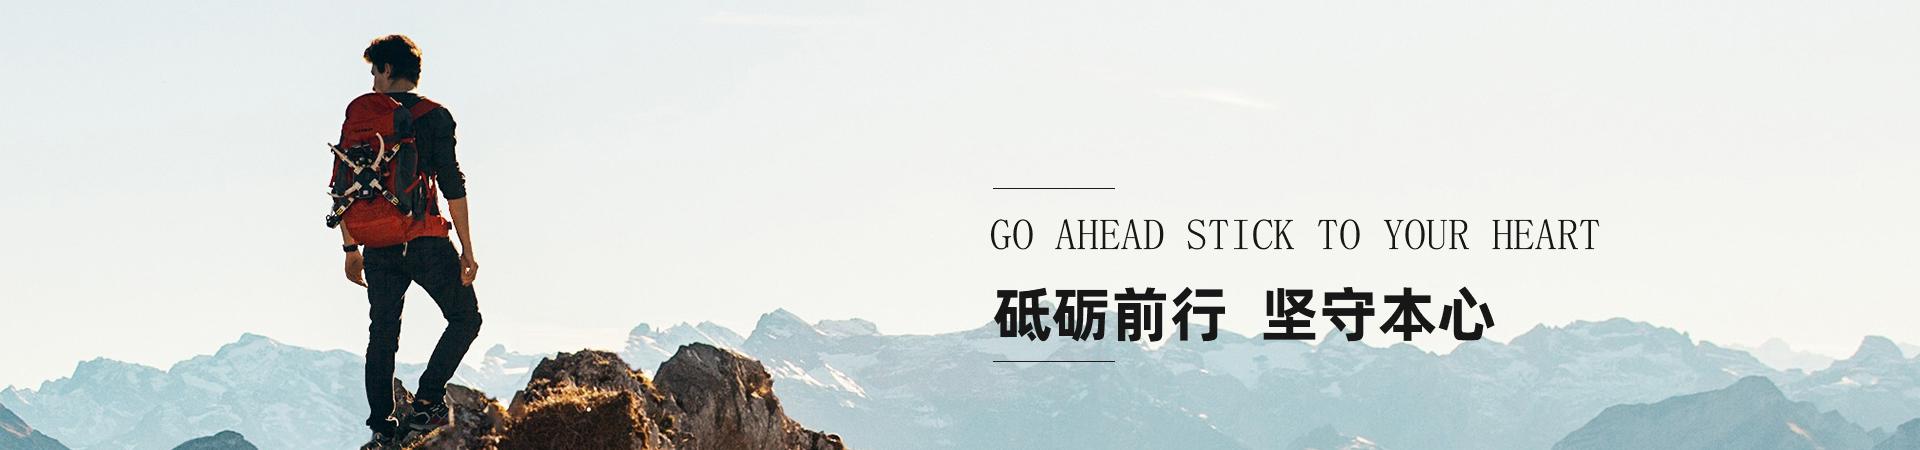 http://www.tj-machine.cn/data/upload/201911/20191116165113_234.jpg